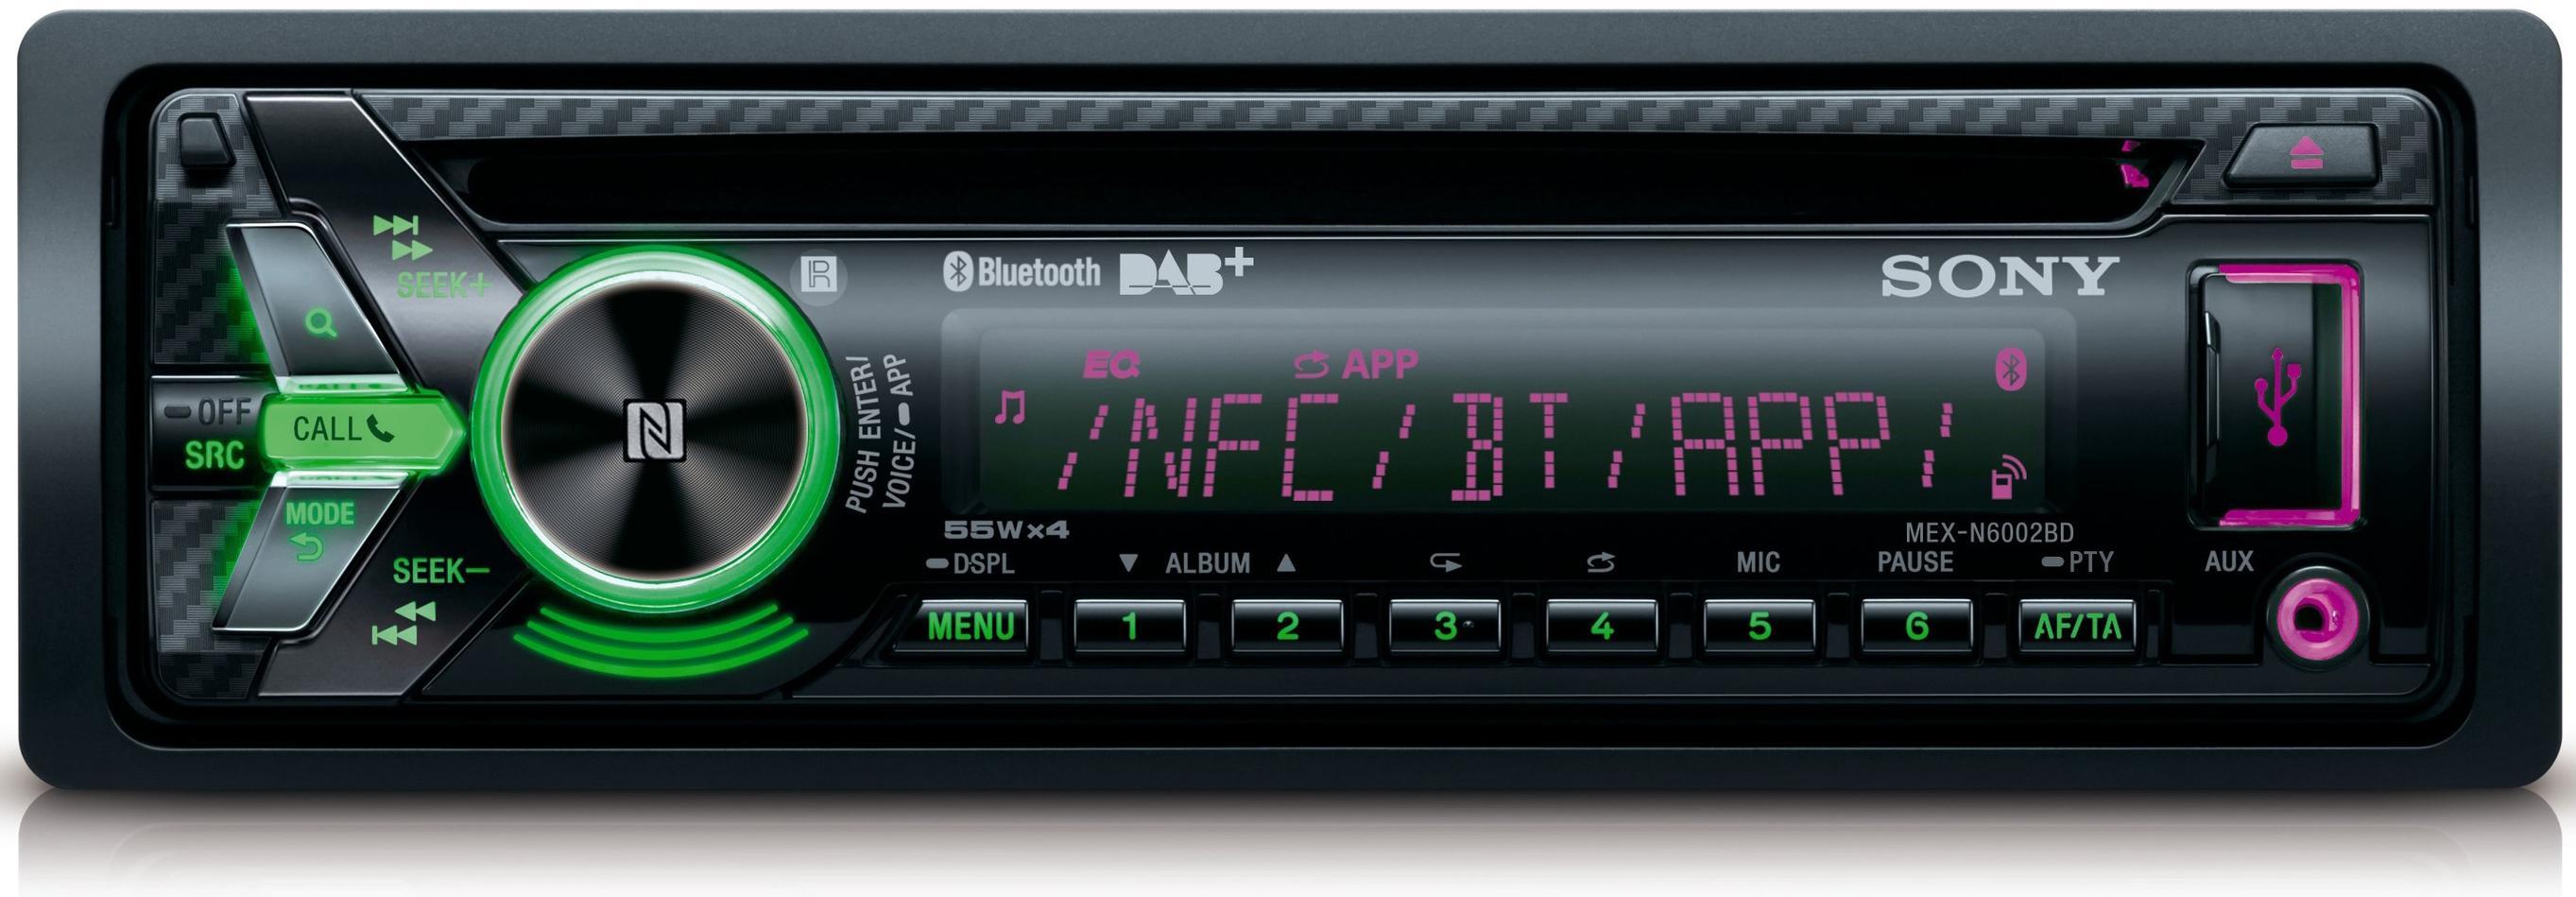 sony mex n6002bd dab dab radio usb cd receiver with bluetooth and nfc ebay. Black Bedroom Furniture Sets. Home Design Ideas